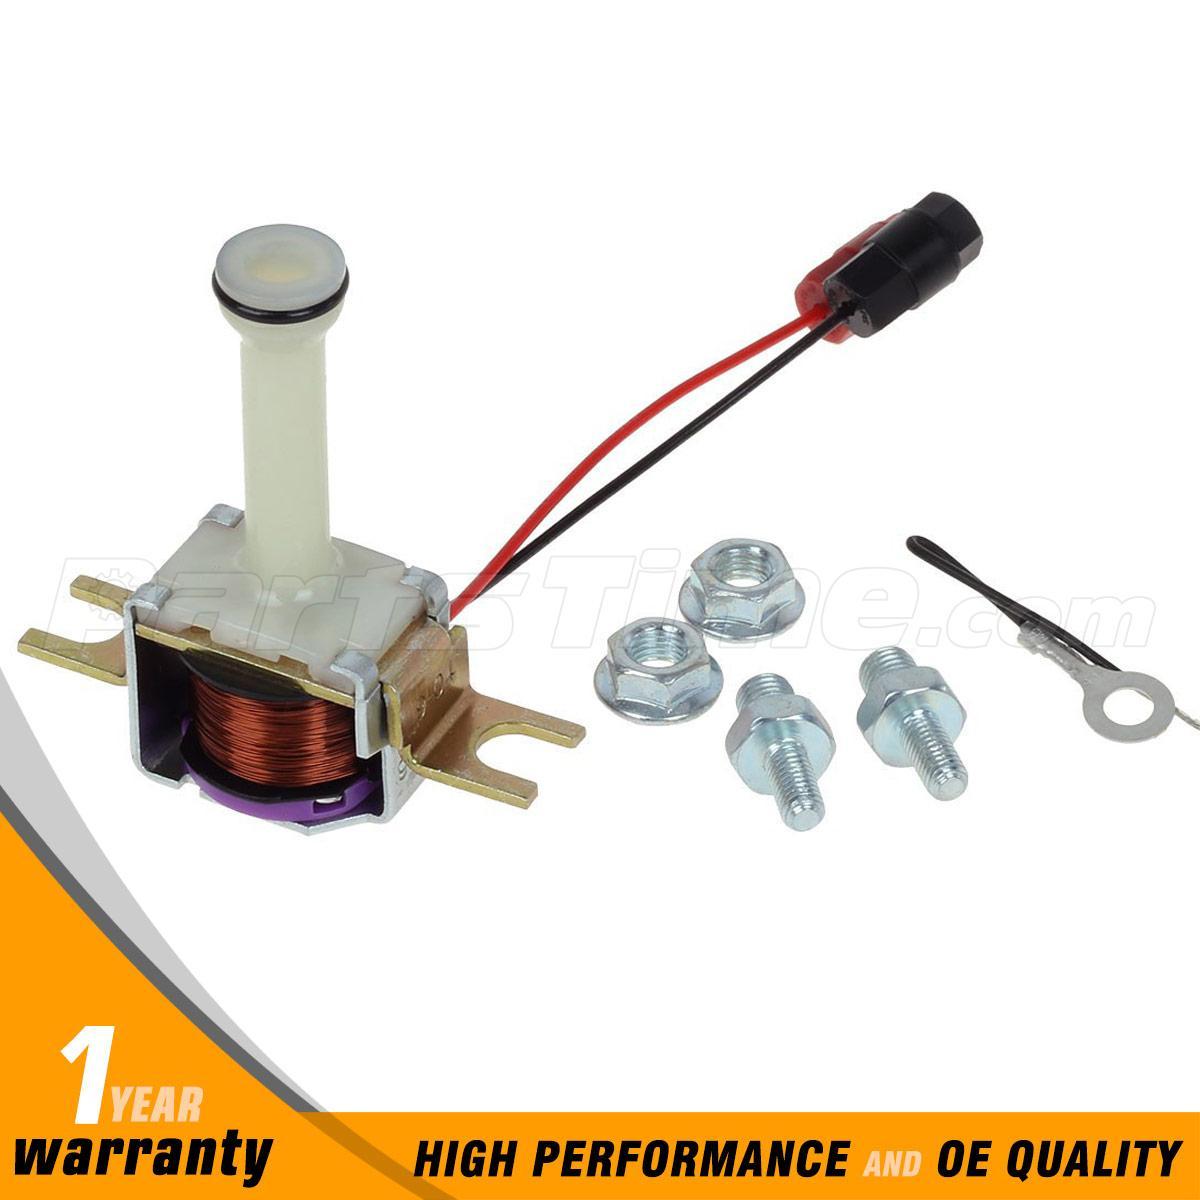 4l60e 4l60 th700 700 r4 transmissions tcc lockup solenoid for gm ebay